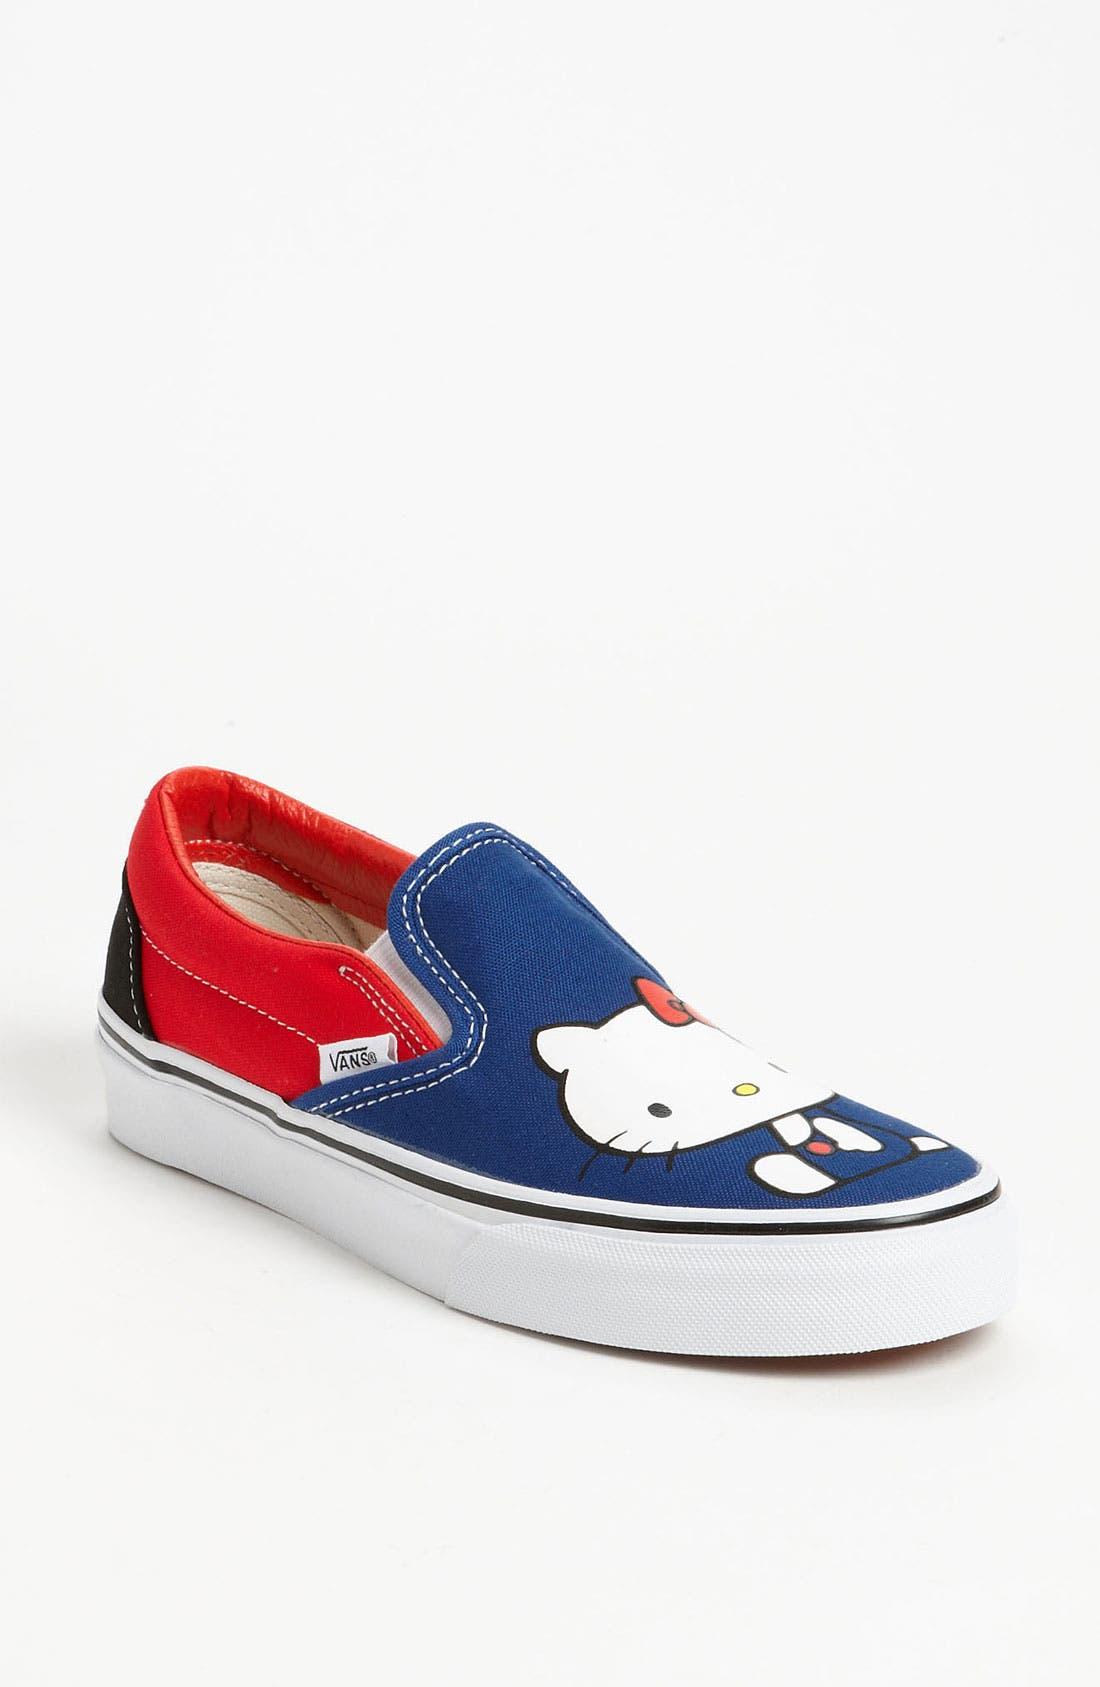 Main Image - Vans 'Classic - Hello Kitty®' Sneaker (Women)